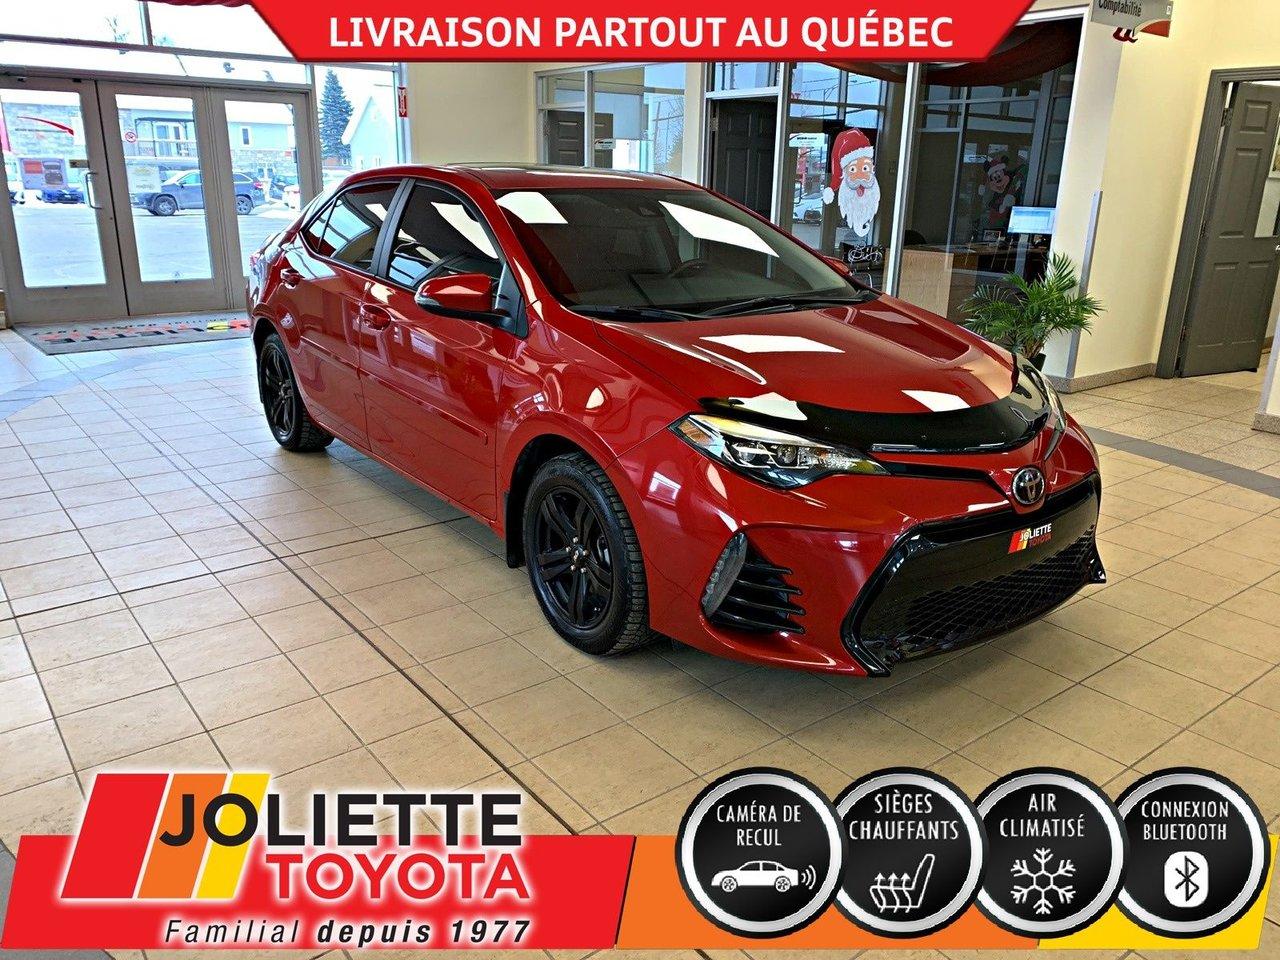 2019 Toyota  Corolla SE-TOIT-BLUETOOTH-CUIR-VOLANT CHAUFFANTS-12 6